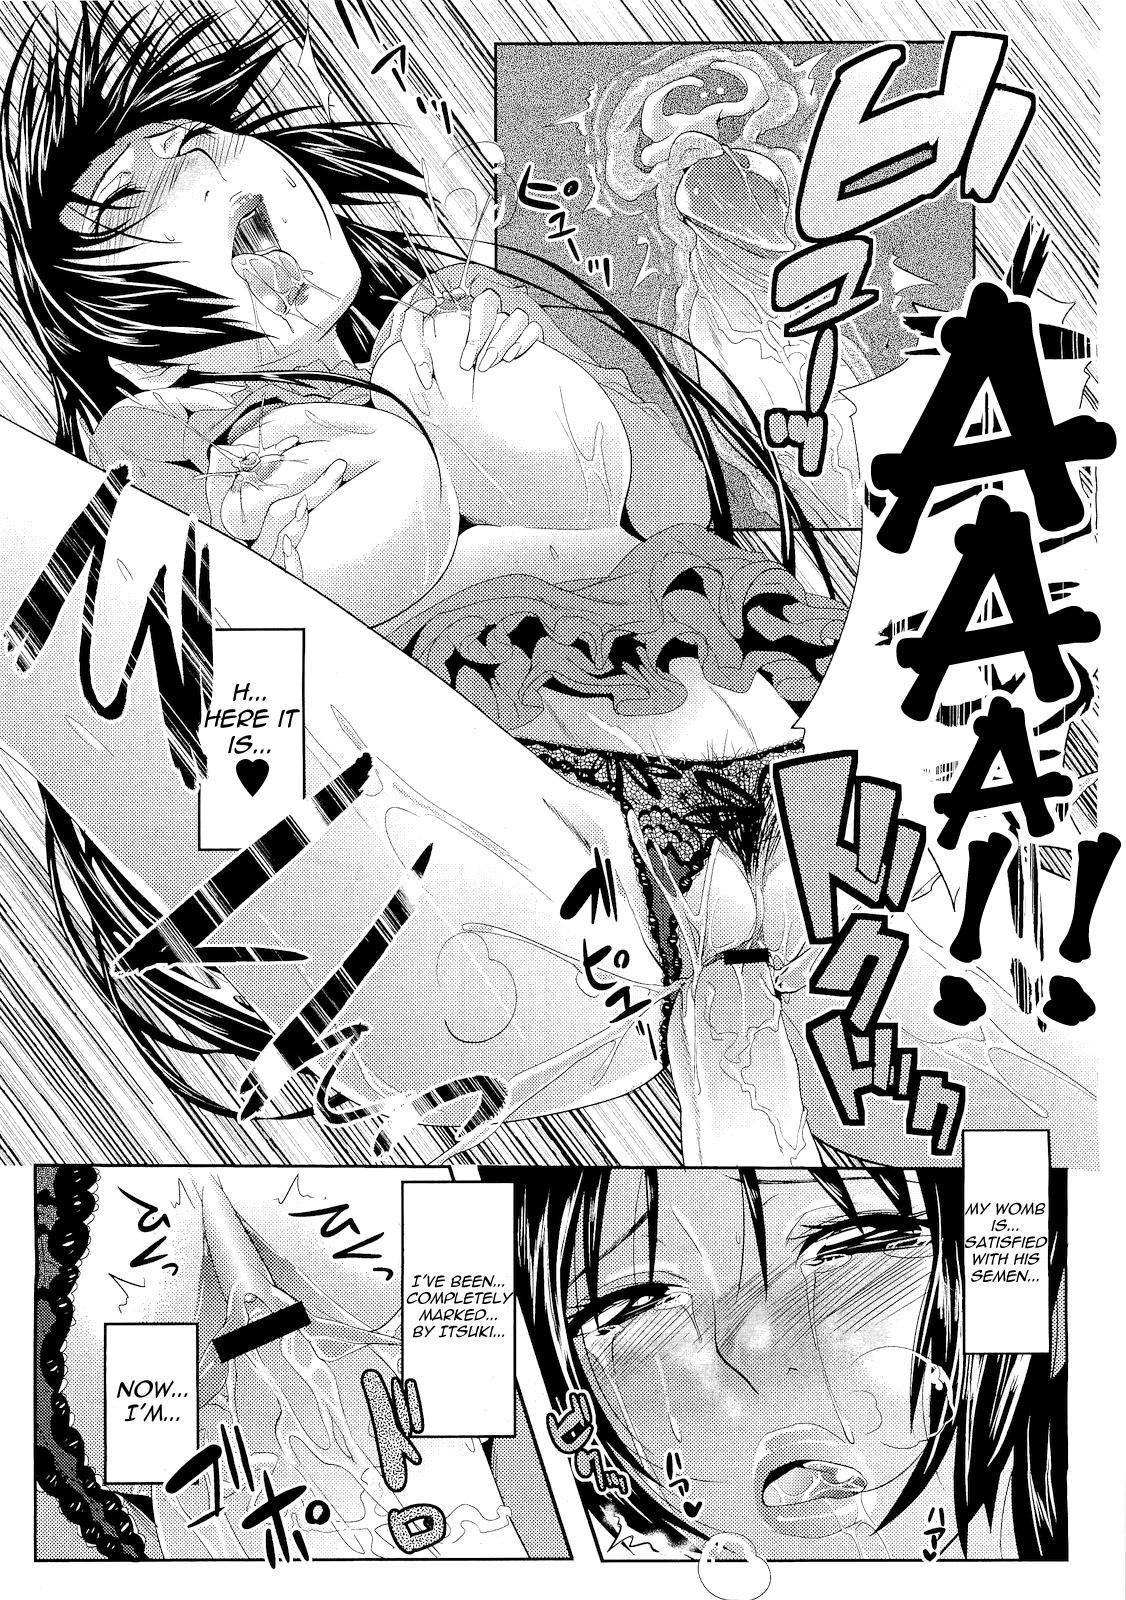 Yuukan Hitozuma - Lady of Leisure, a Sugar Mama 18